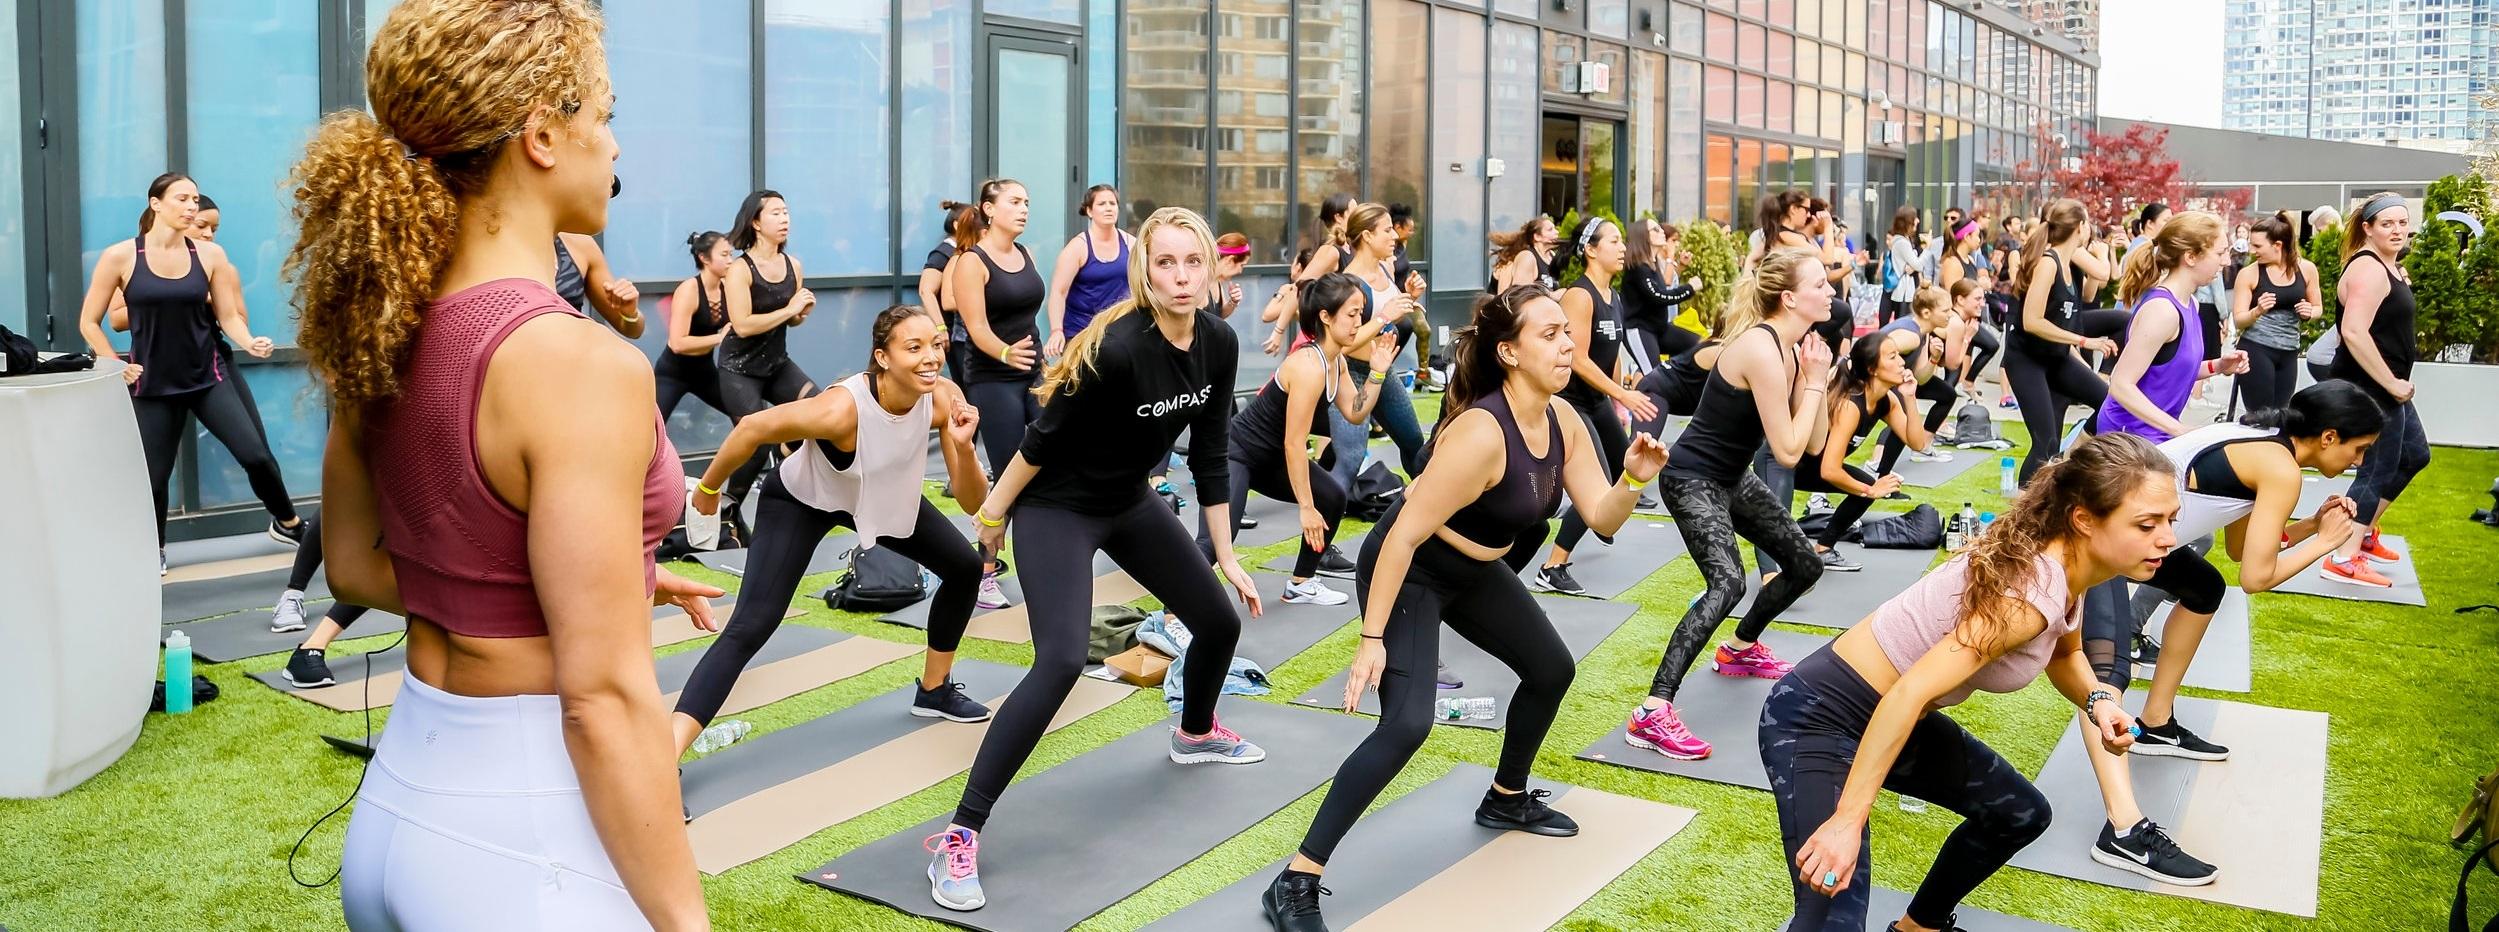 National Fitness Day US.jpg